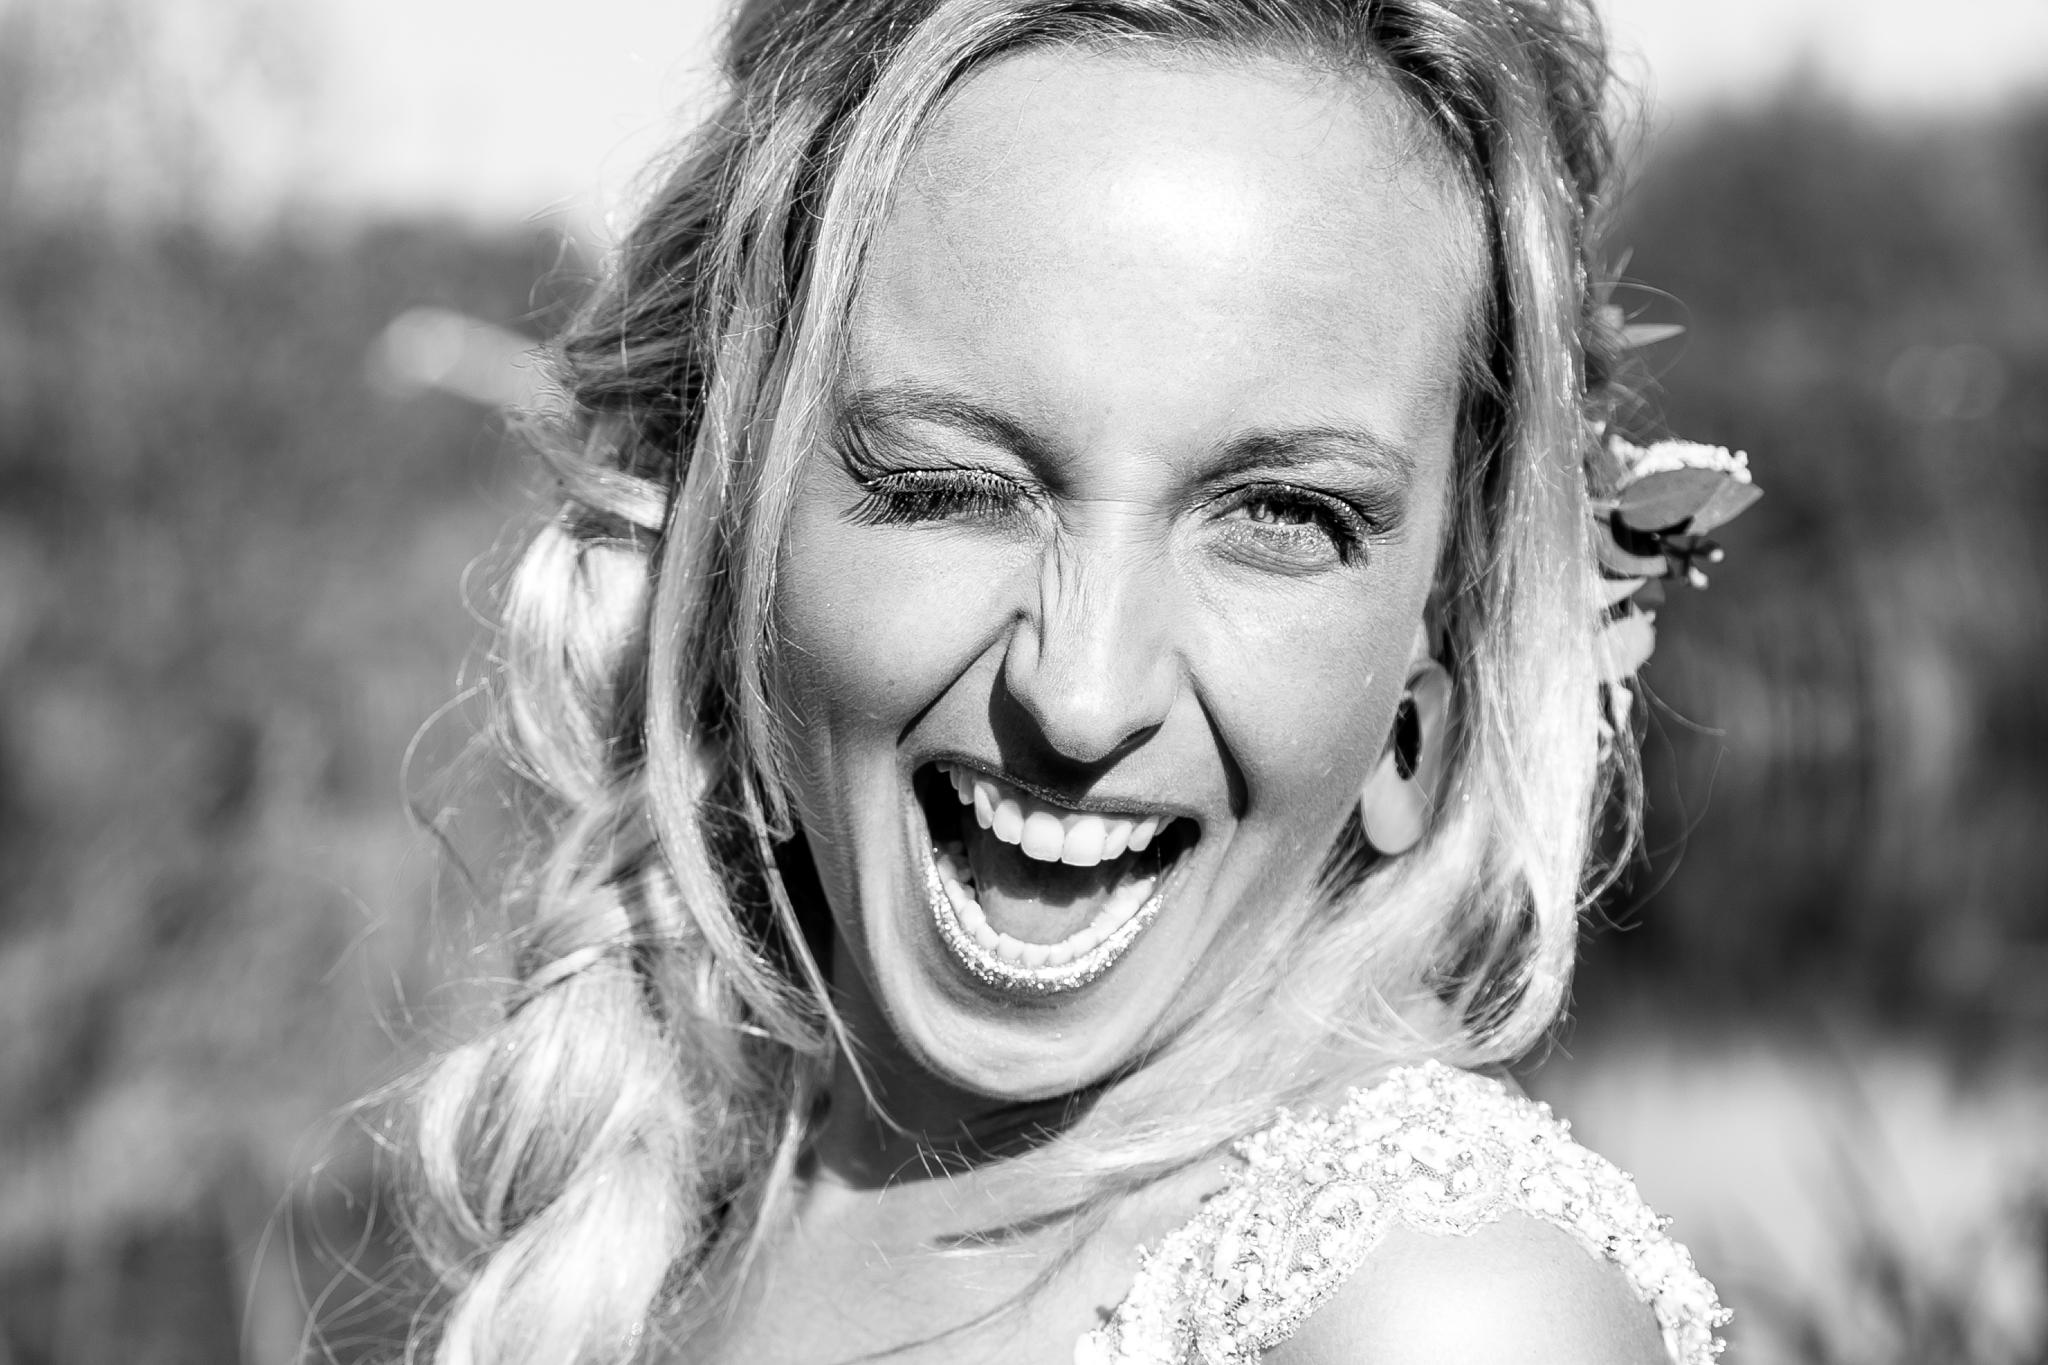 trouwfotograaf zuid holland, bruidsfotografie zuid holland, spontane bruidsfotografie, professioneel trouwfotograaf, award winning bruidsfotograaf